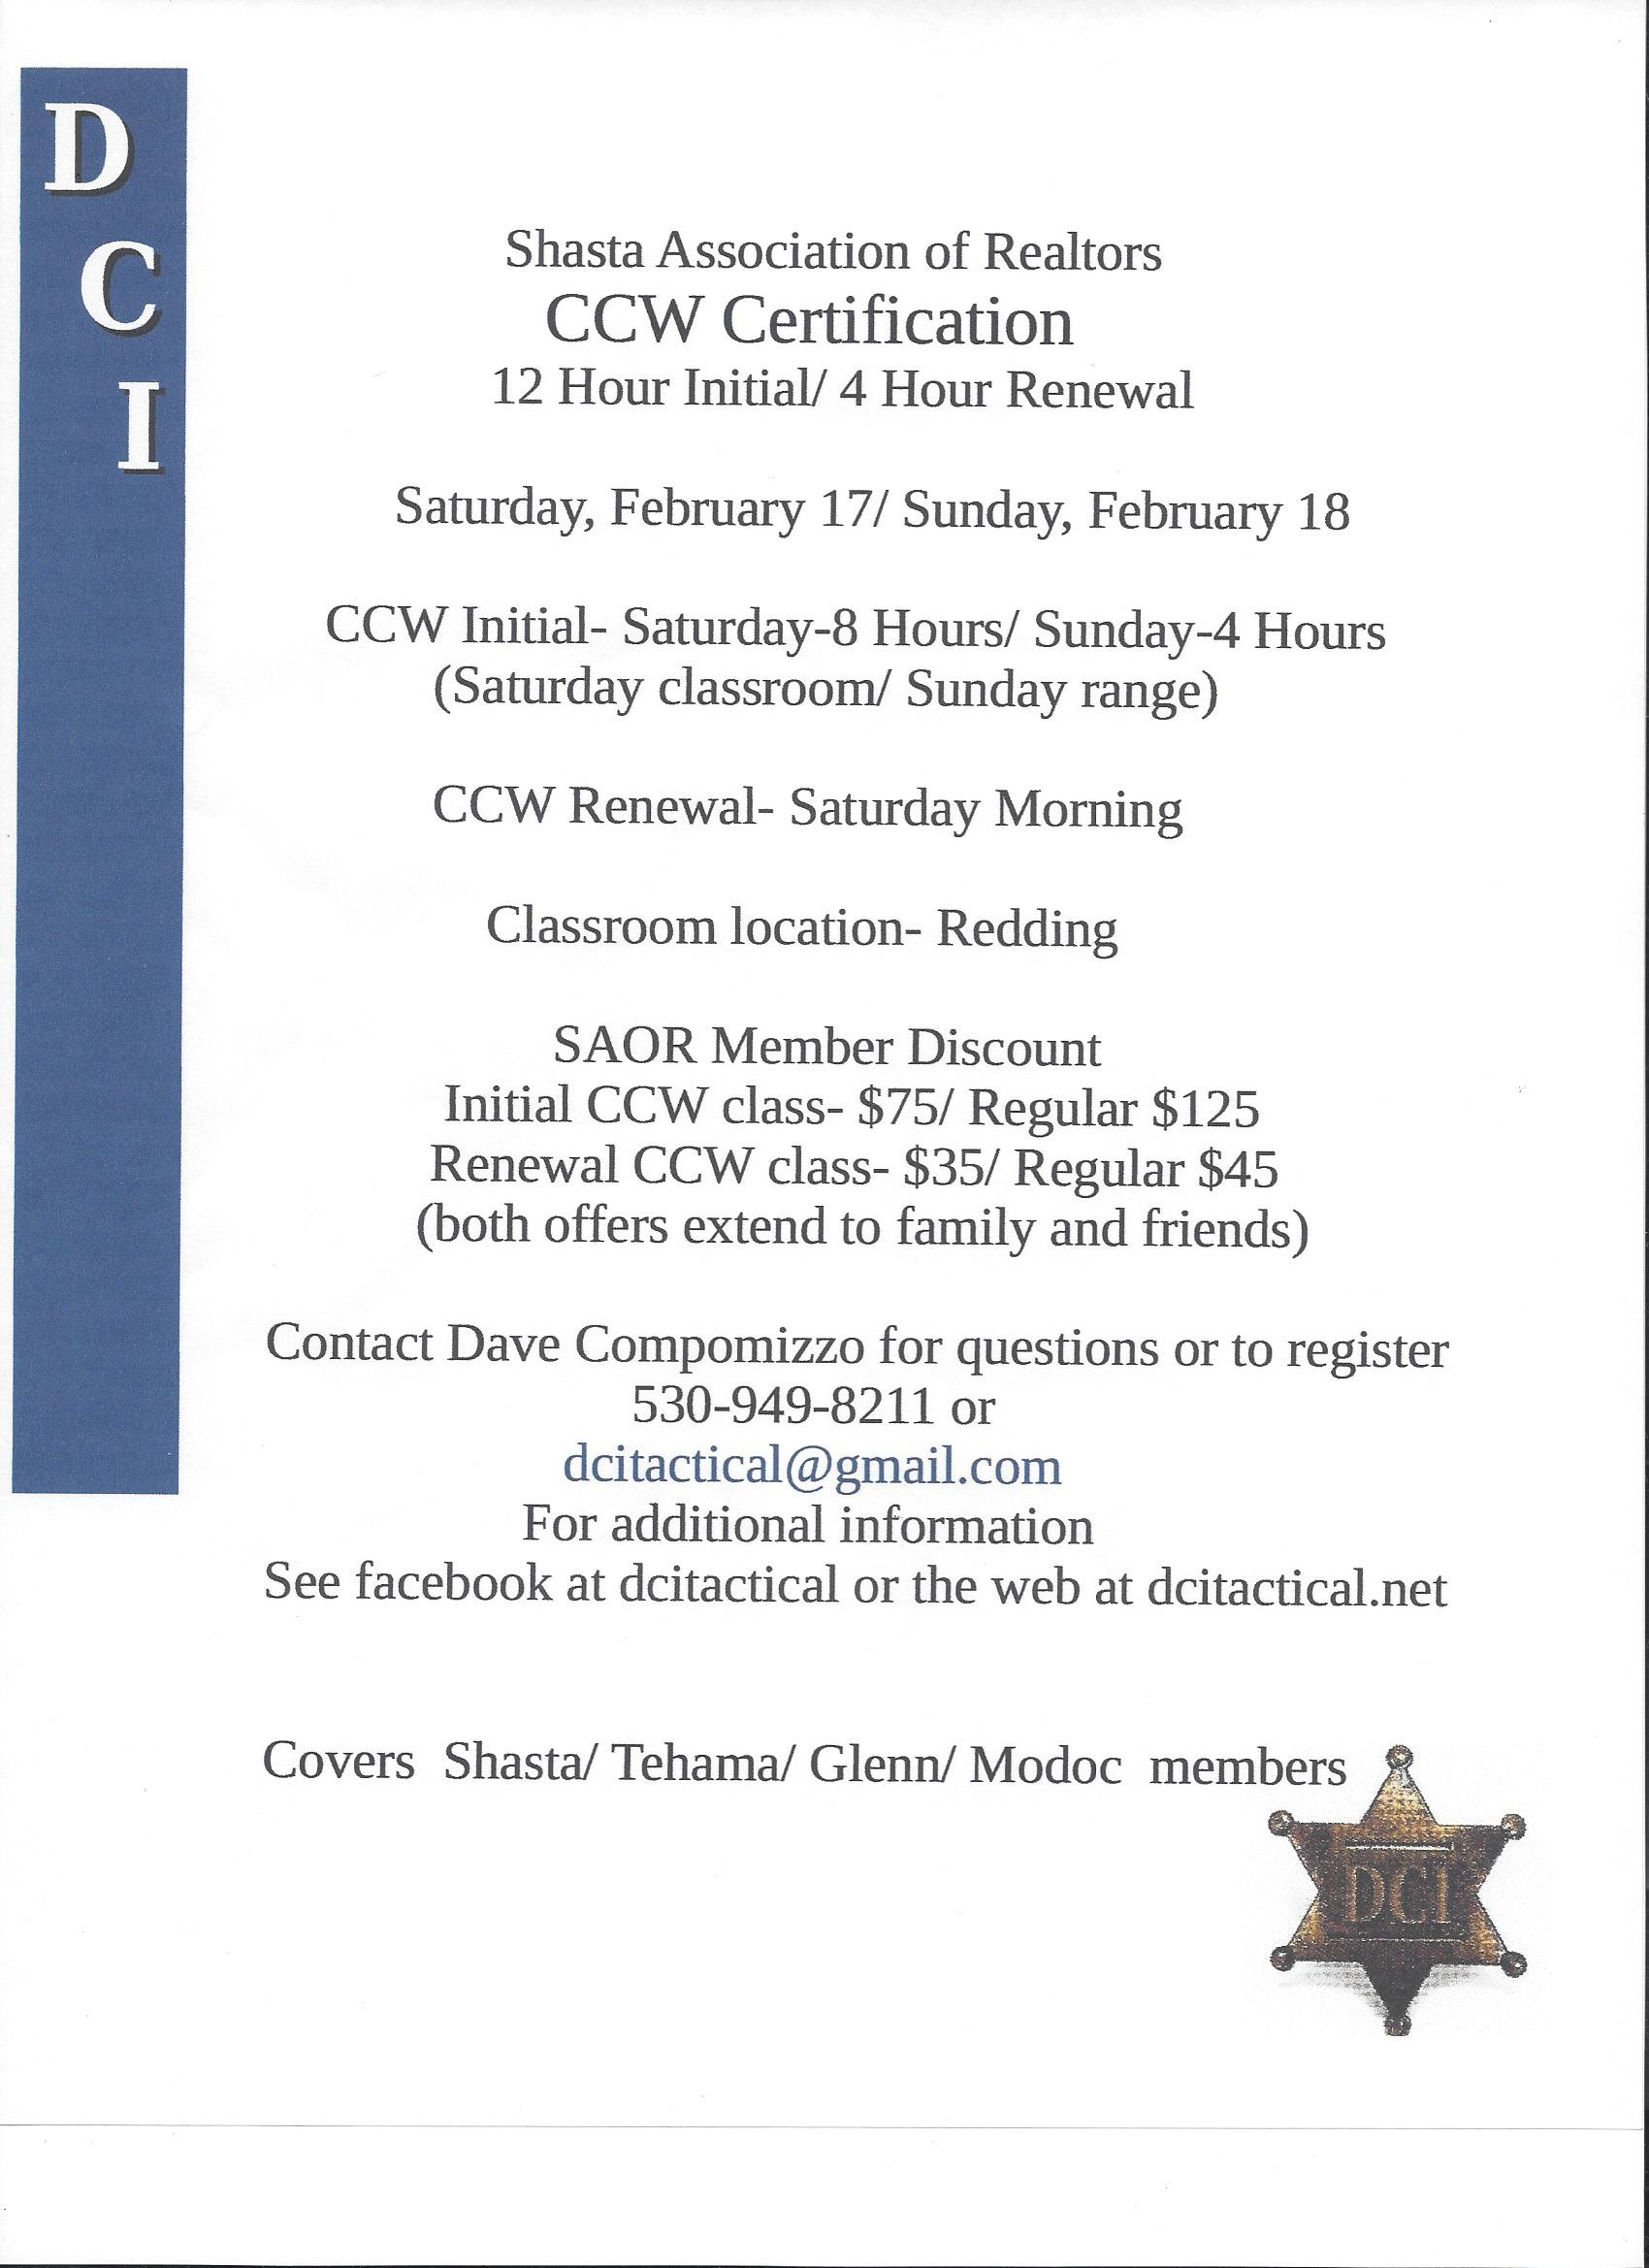 18-01-26;DCI Tactical CWP Training Feb 2018.jpg